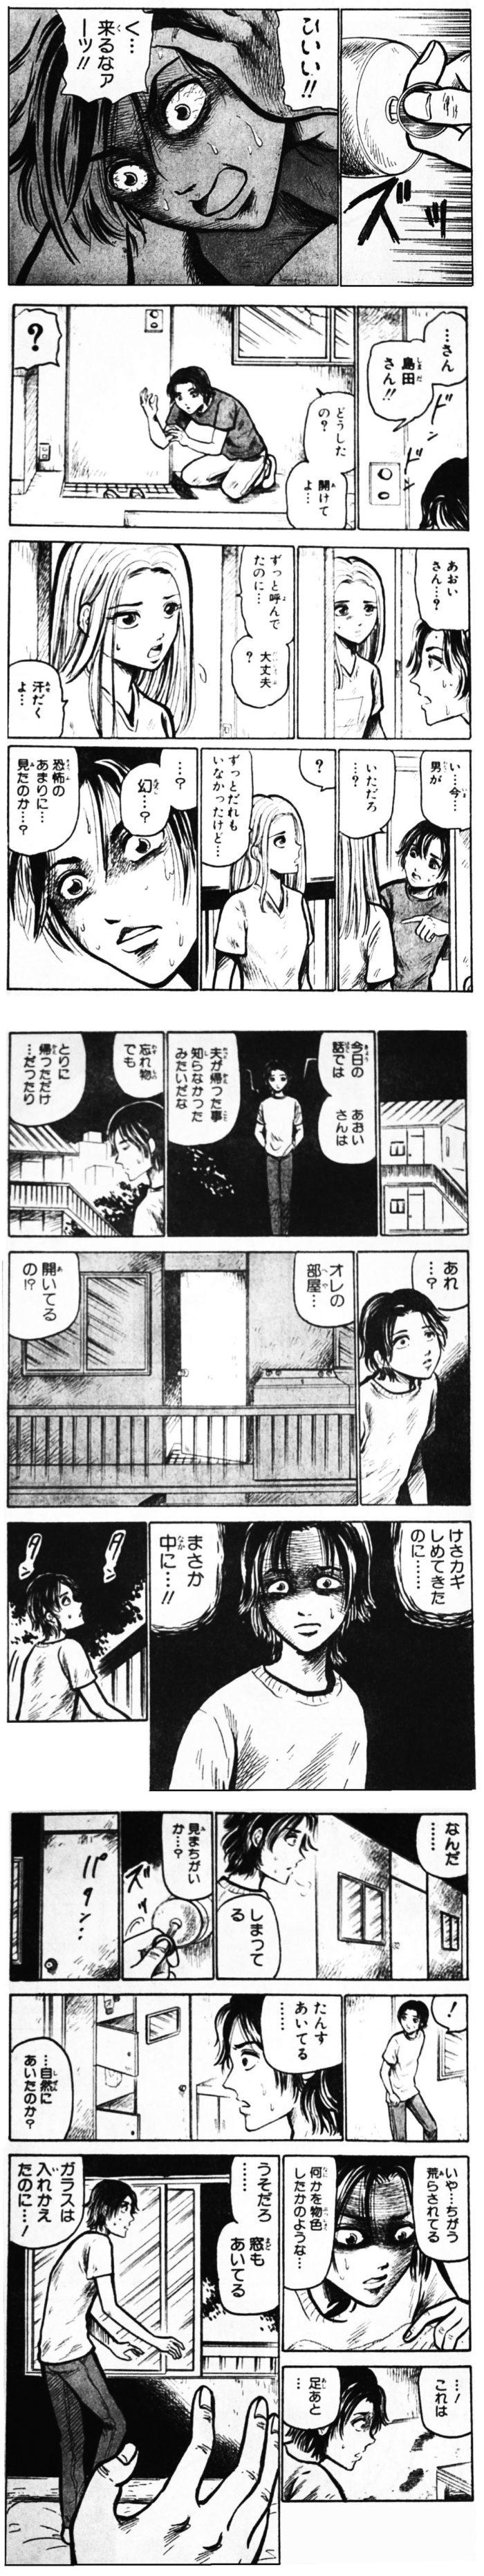 koufukuno-kagi2-03